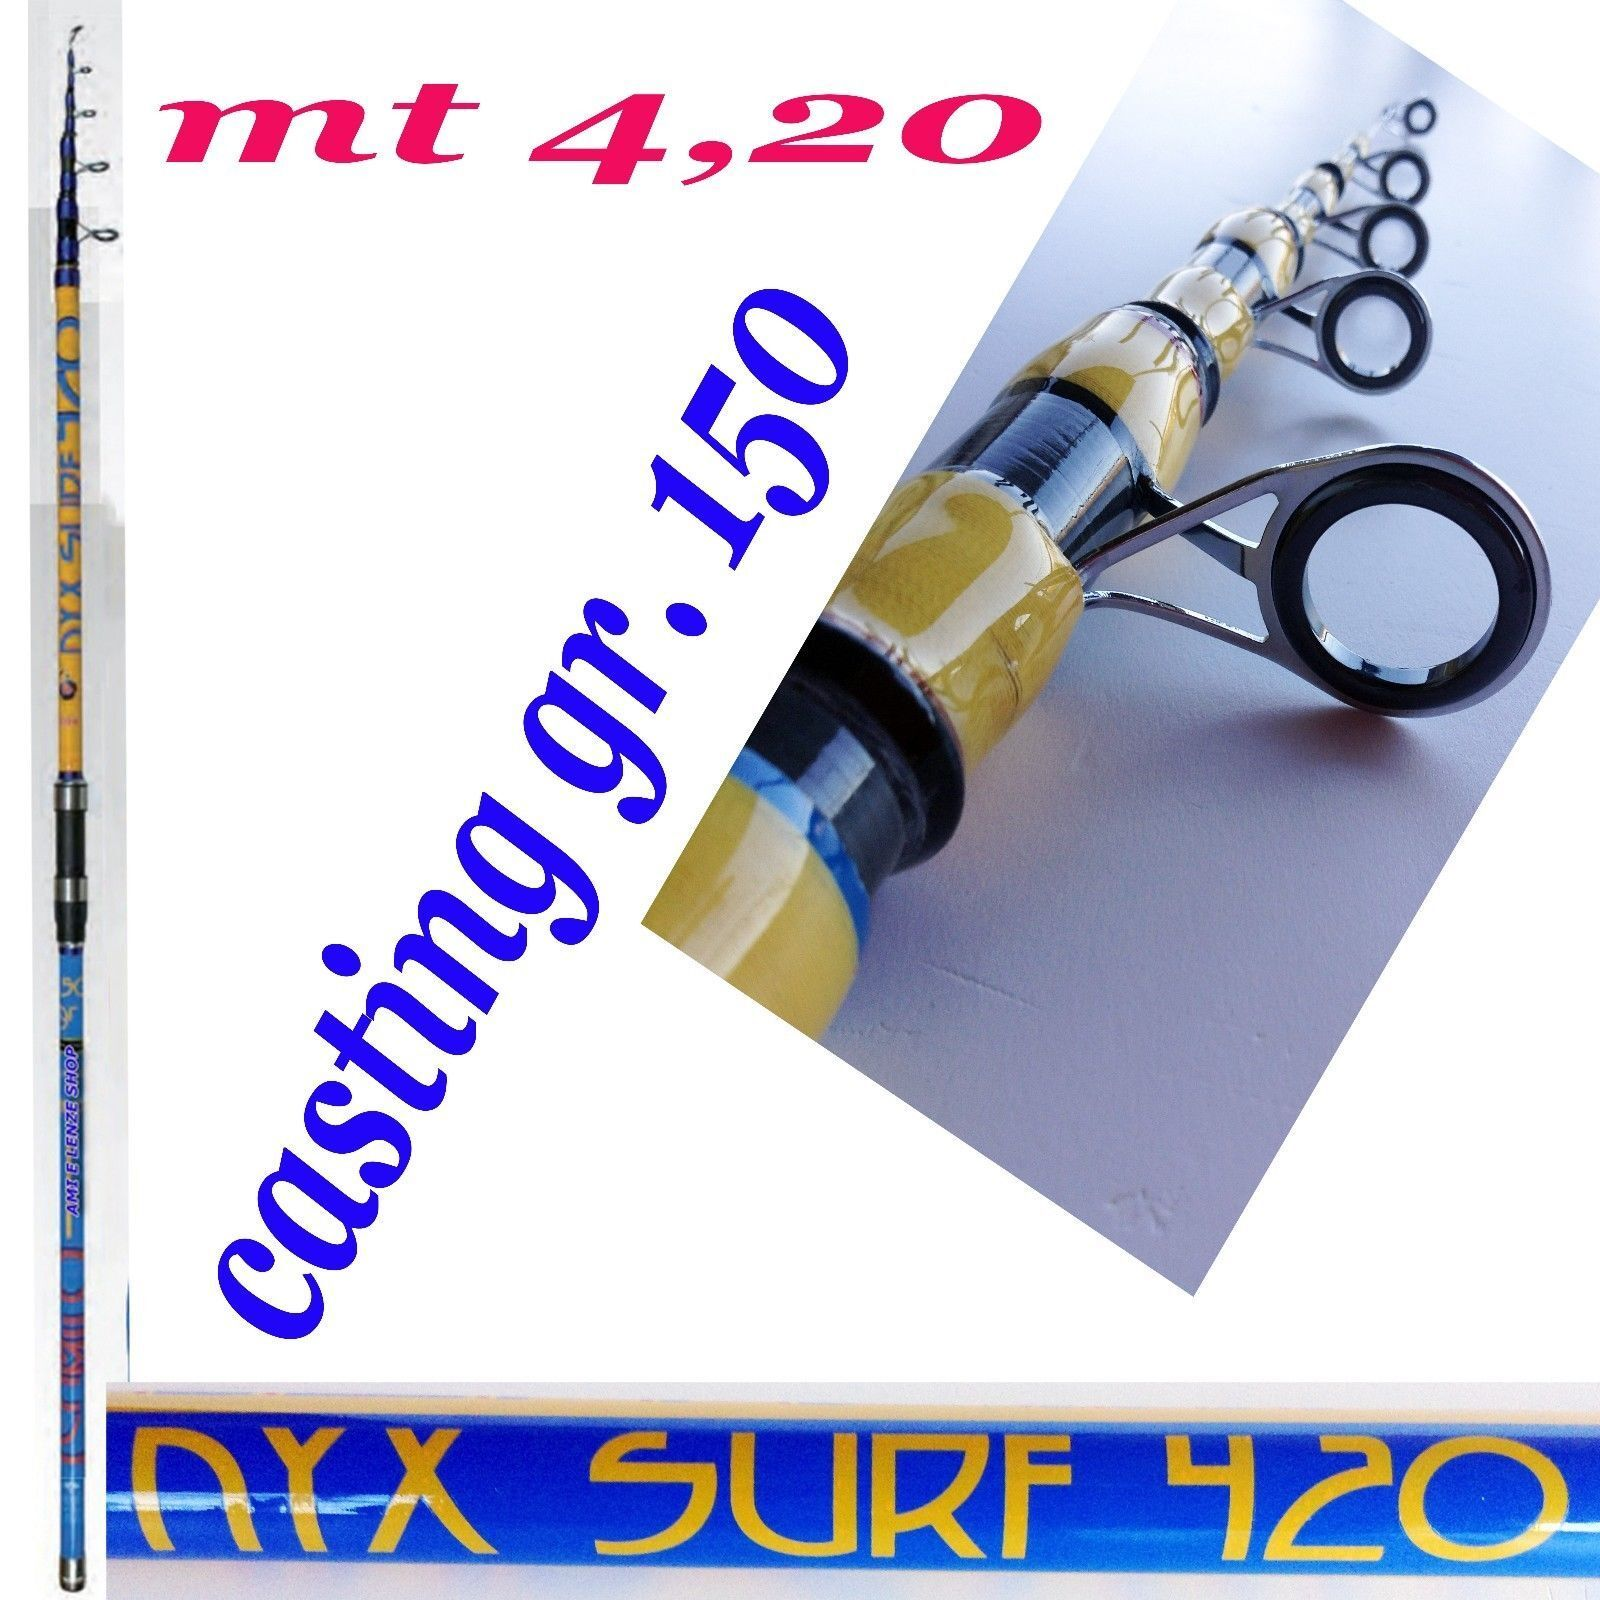 CANNA SURFCASTING autoBONIO MT 4,20 AZ.GR 150 PESCA MARE ORATA MORMORA